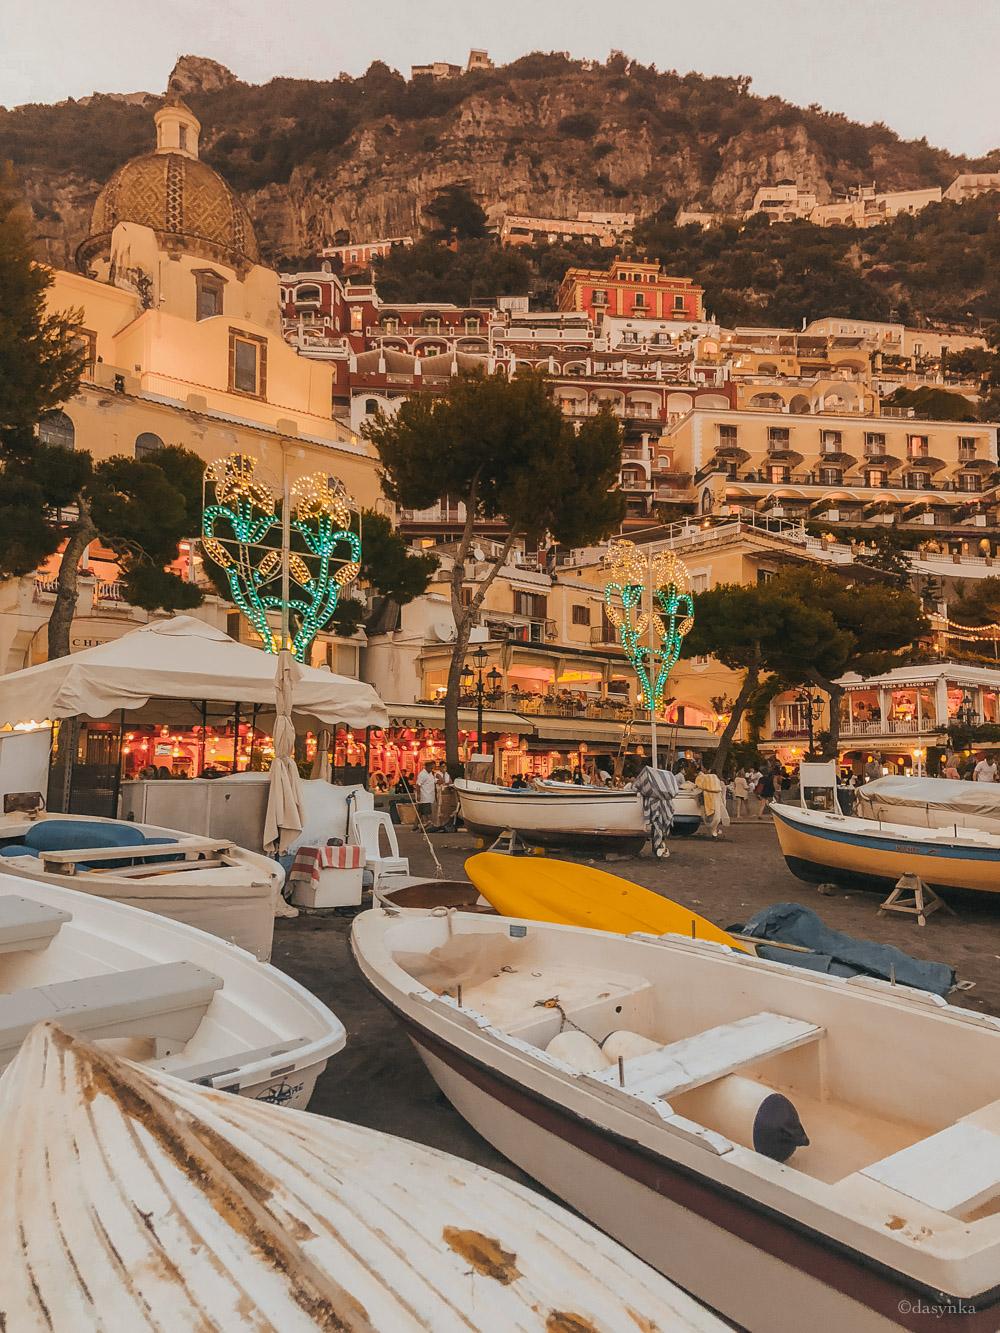 dasynka-fashion-blog-blogger-influencer-inspiration-shooting-model-globettrotter-travel-girl-lookbook-instagram-long-hair-street-style-casual-italy-lifestyle-outfit-poses-positano-amalfi-coast-blue-long-dress-colorful-beach-marina-grande-chloe-bag-sea-italy-look-ideas-elegant-italian-style-sandals-tips-atrani-habits-sorbet-lemon-covo-dei-saraceni-marina-grande-food-chez-black-sunset-boat